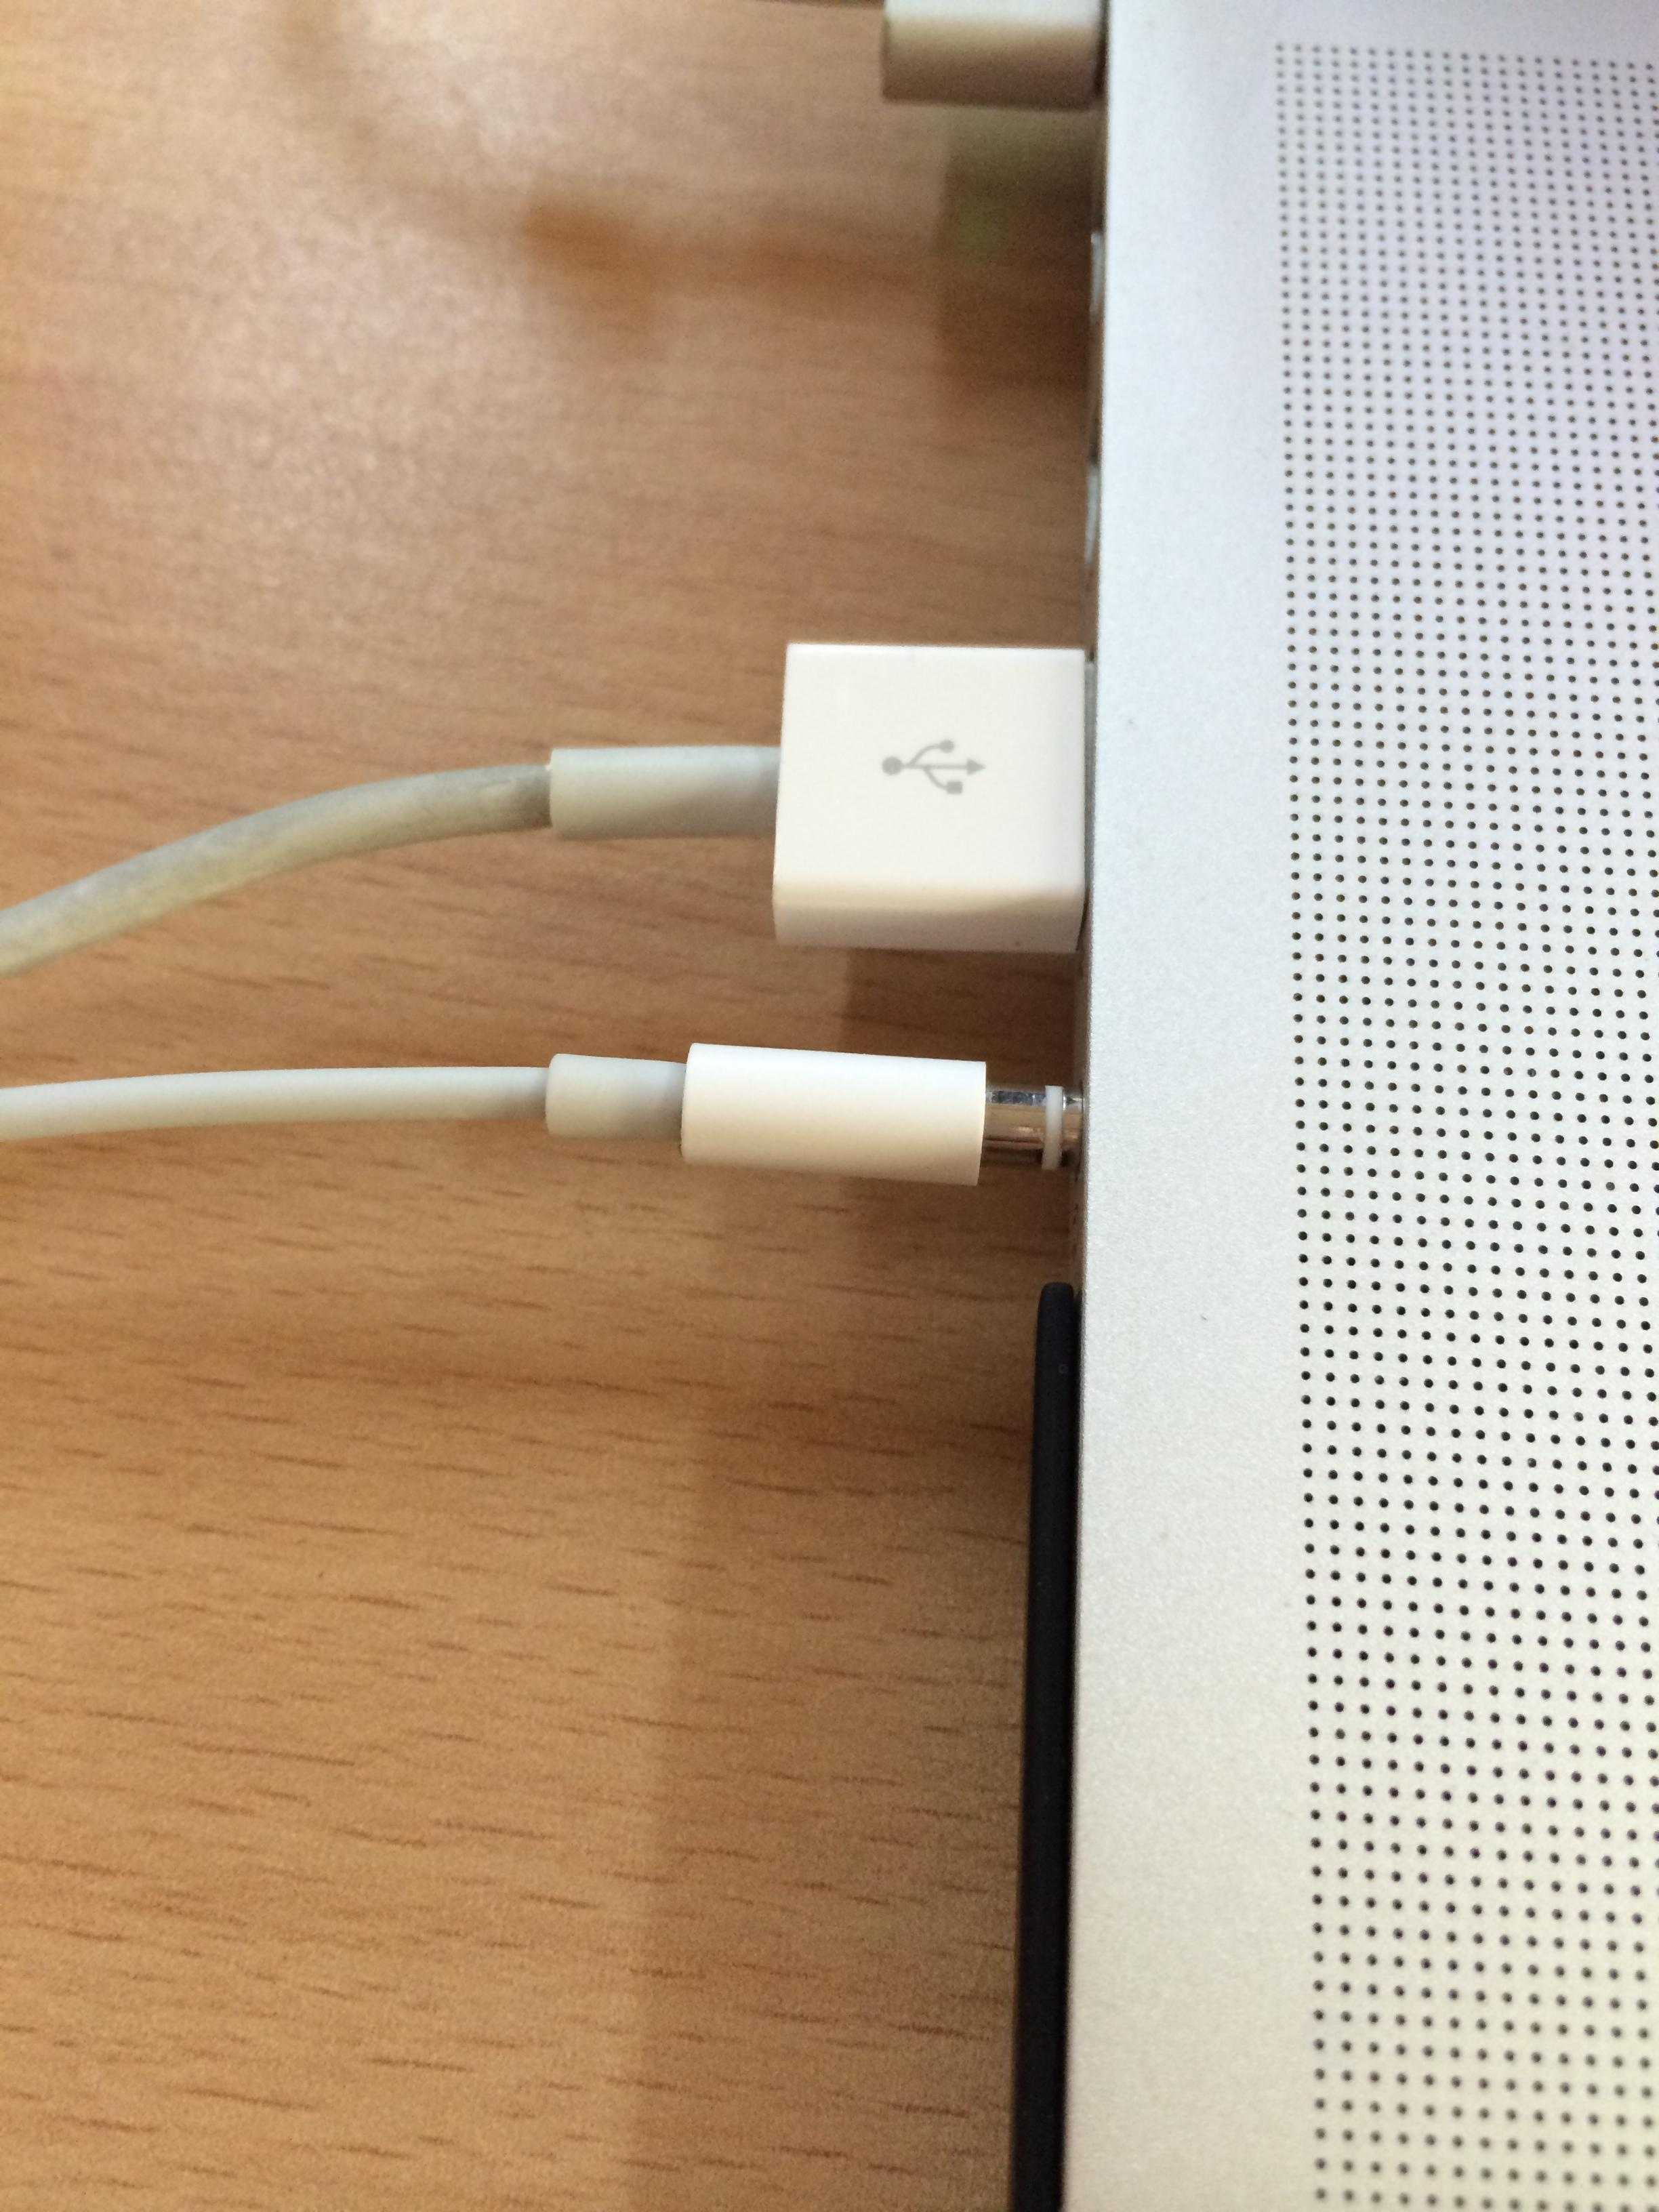 Audio Headphones Jack Not Pluggable Into Macbook Pro